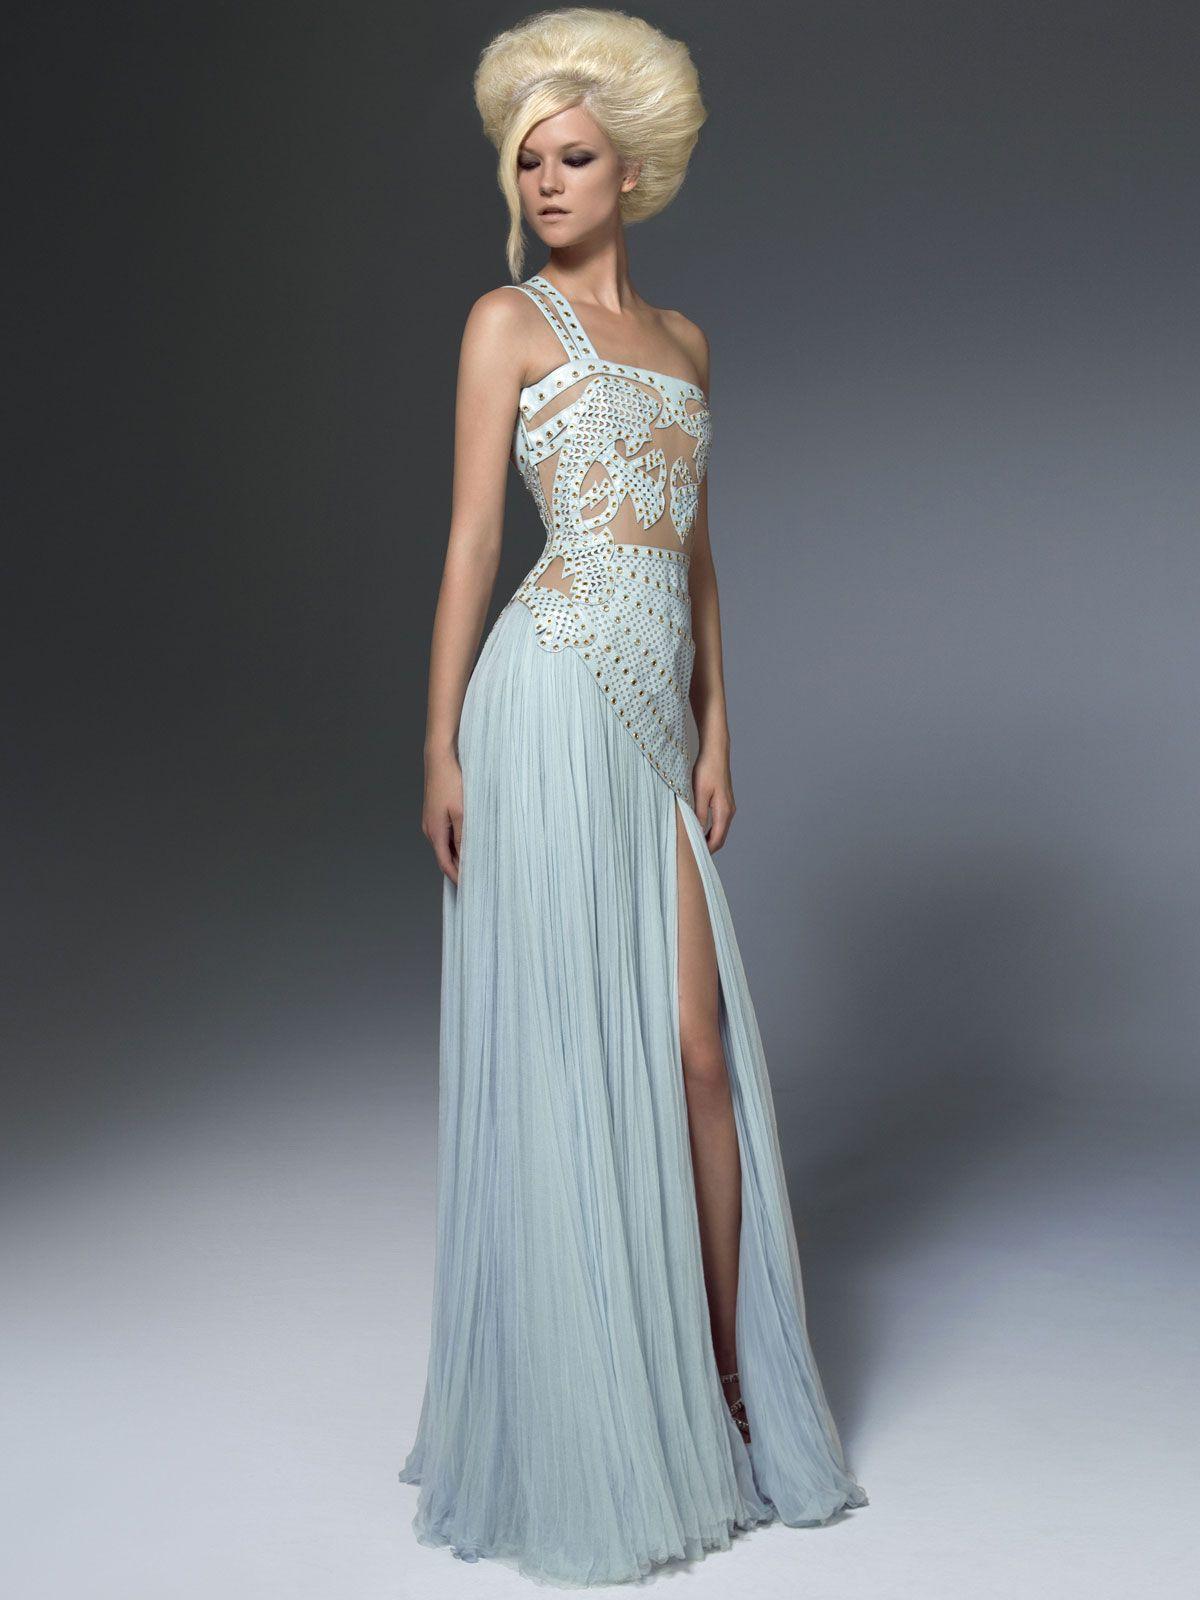 atelier versace | Fashion, Beautiful dresses, Dresses